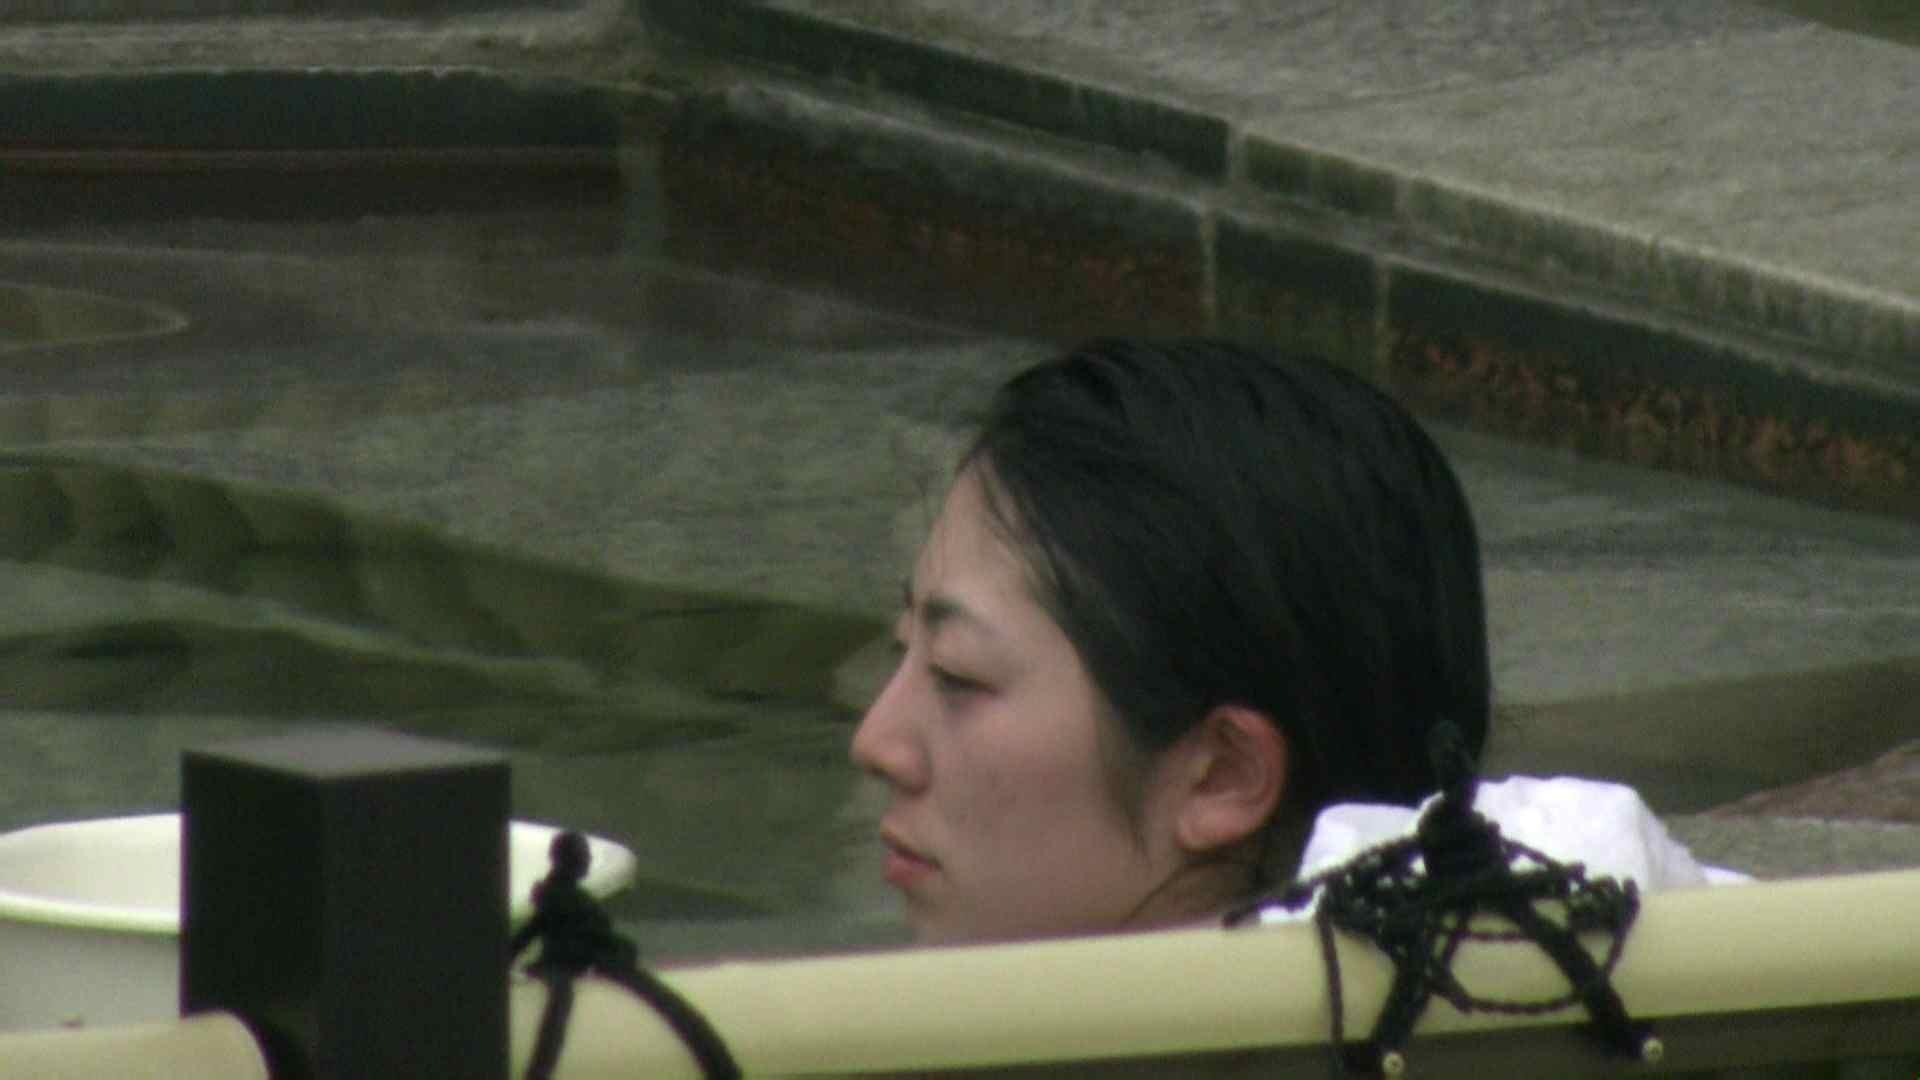 Aquaな露天風呂Vol.04 露天風呂編 | 盗撮シリーズ  94PIX 17